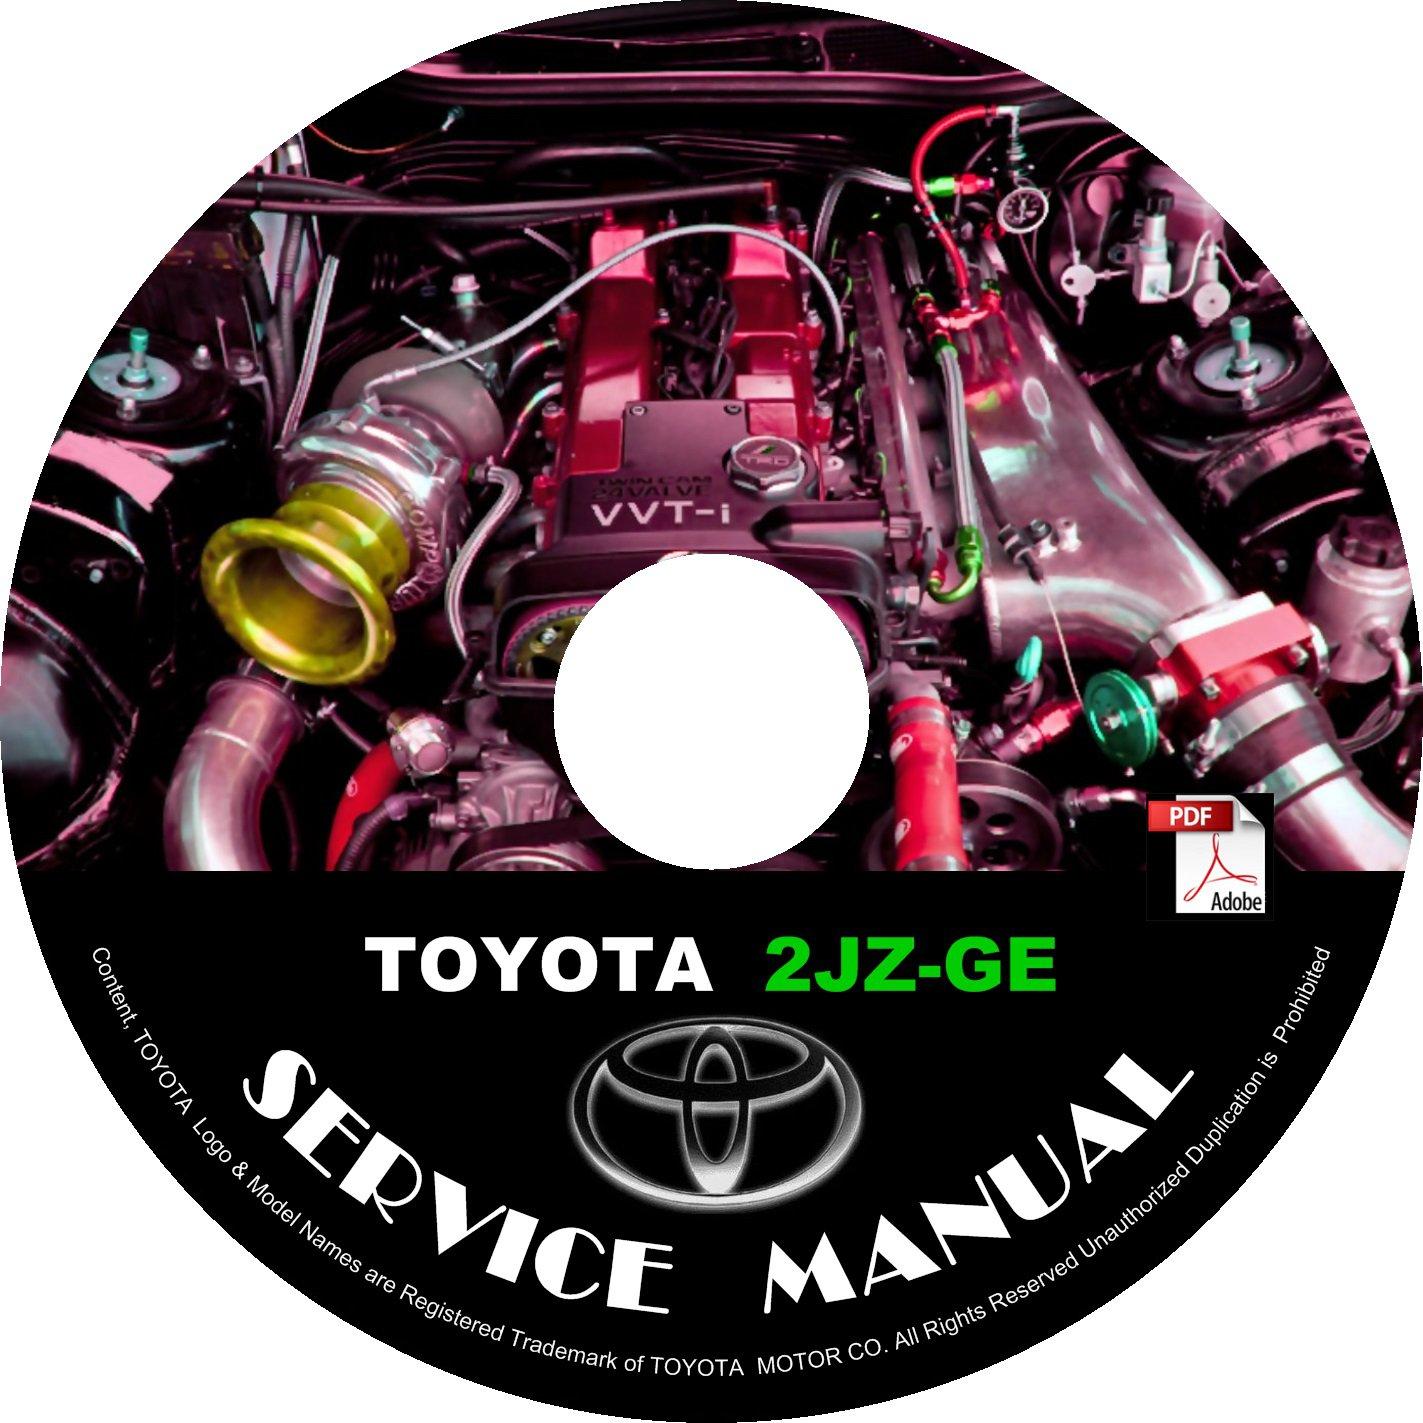 TOYOTA Engine 2JZ-GE Service Repair Shop Manual on CD Fix Repair Rebuild 2JZGE Workshop